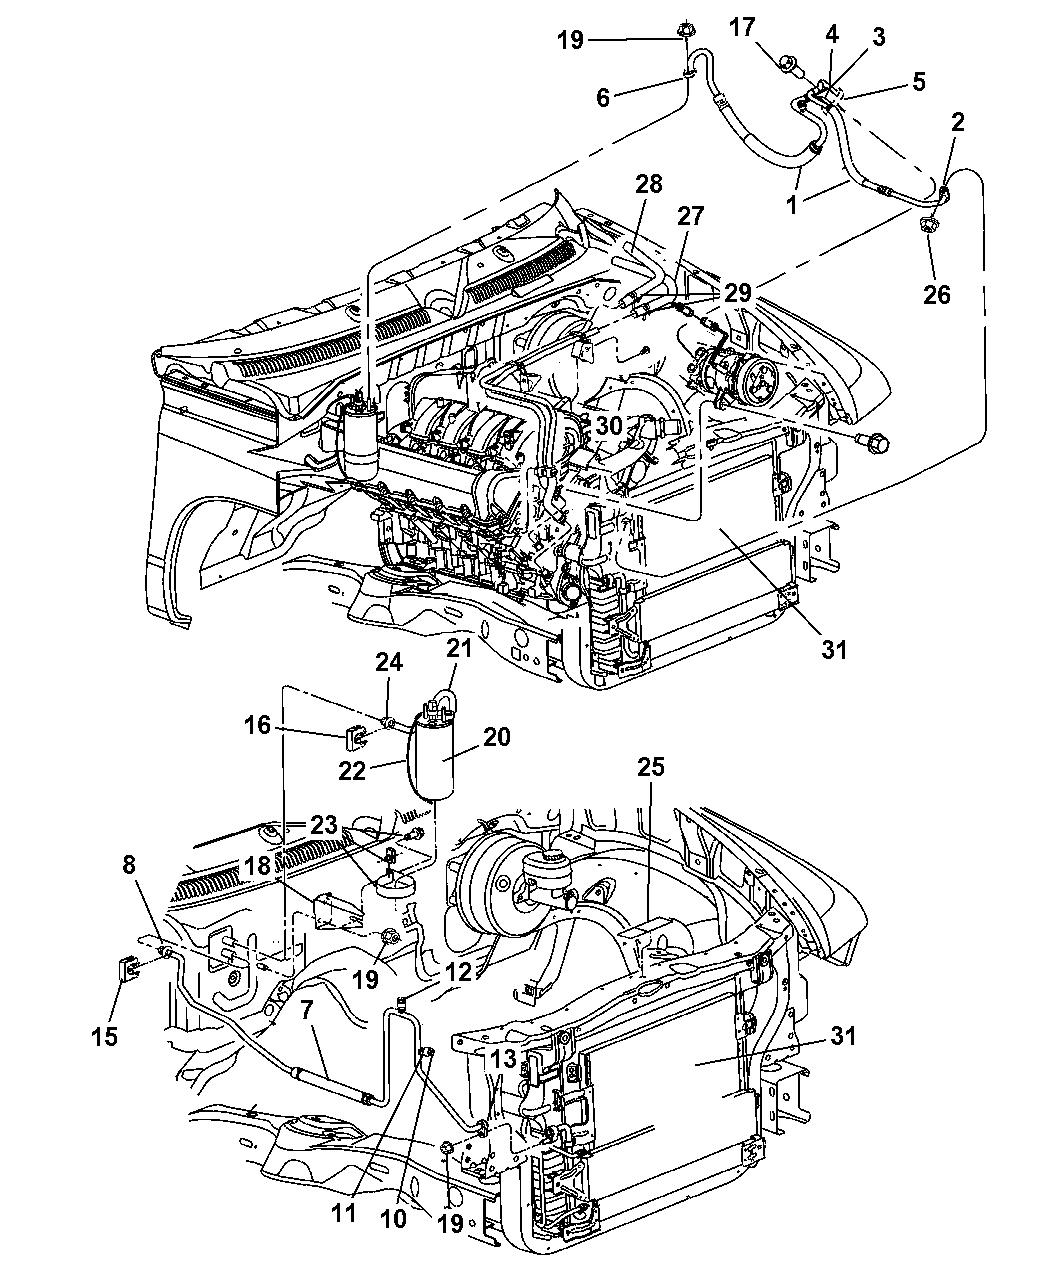 55056350AA - Genuine Dodge BRACKET-ACCUMULATOR RETAINING